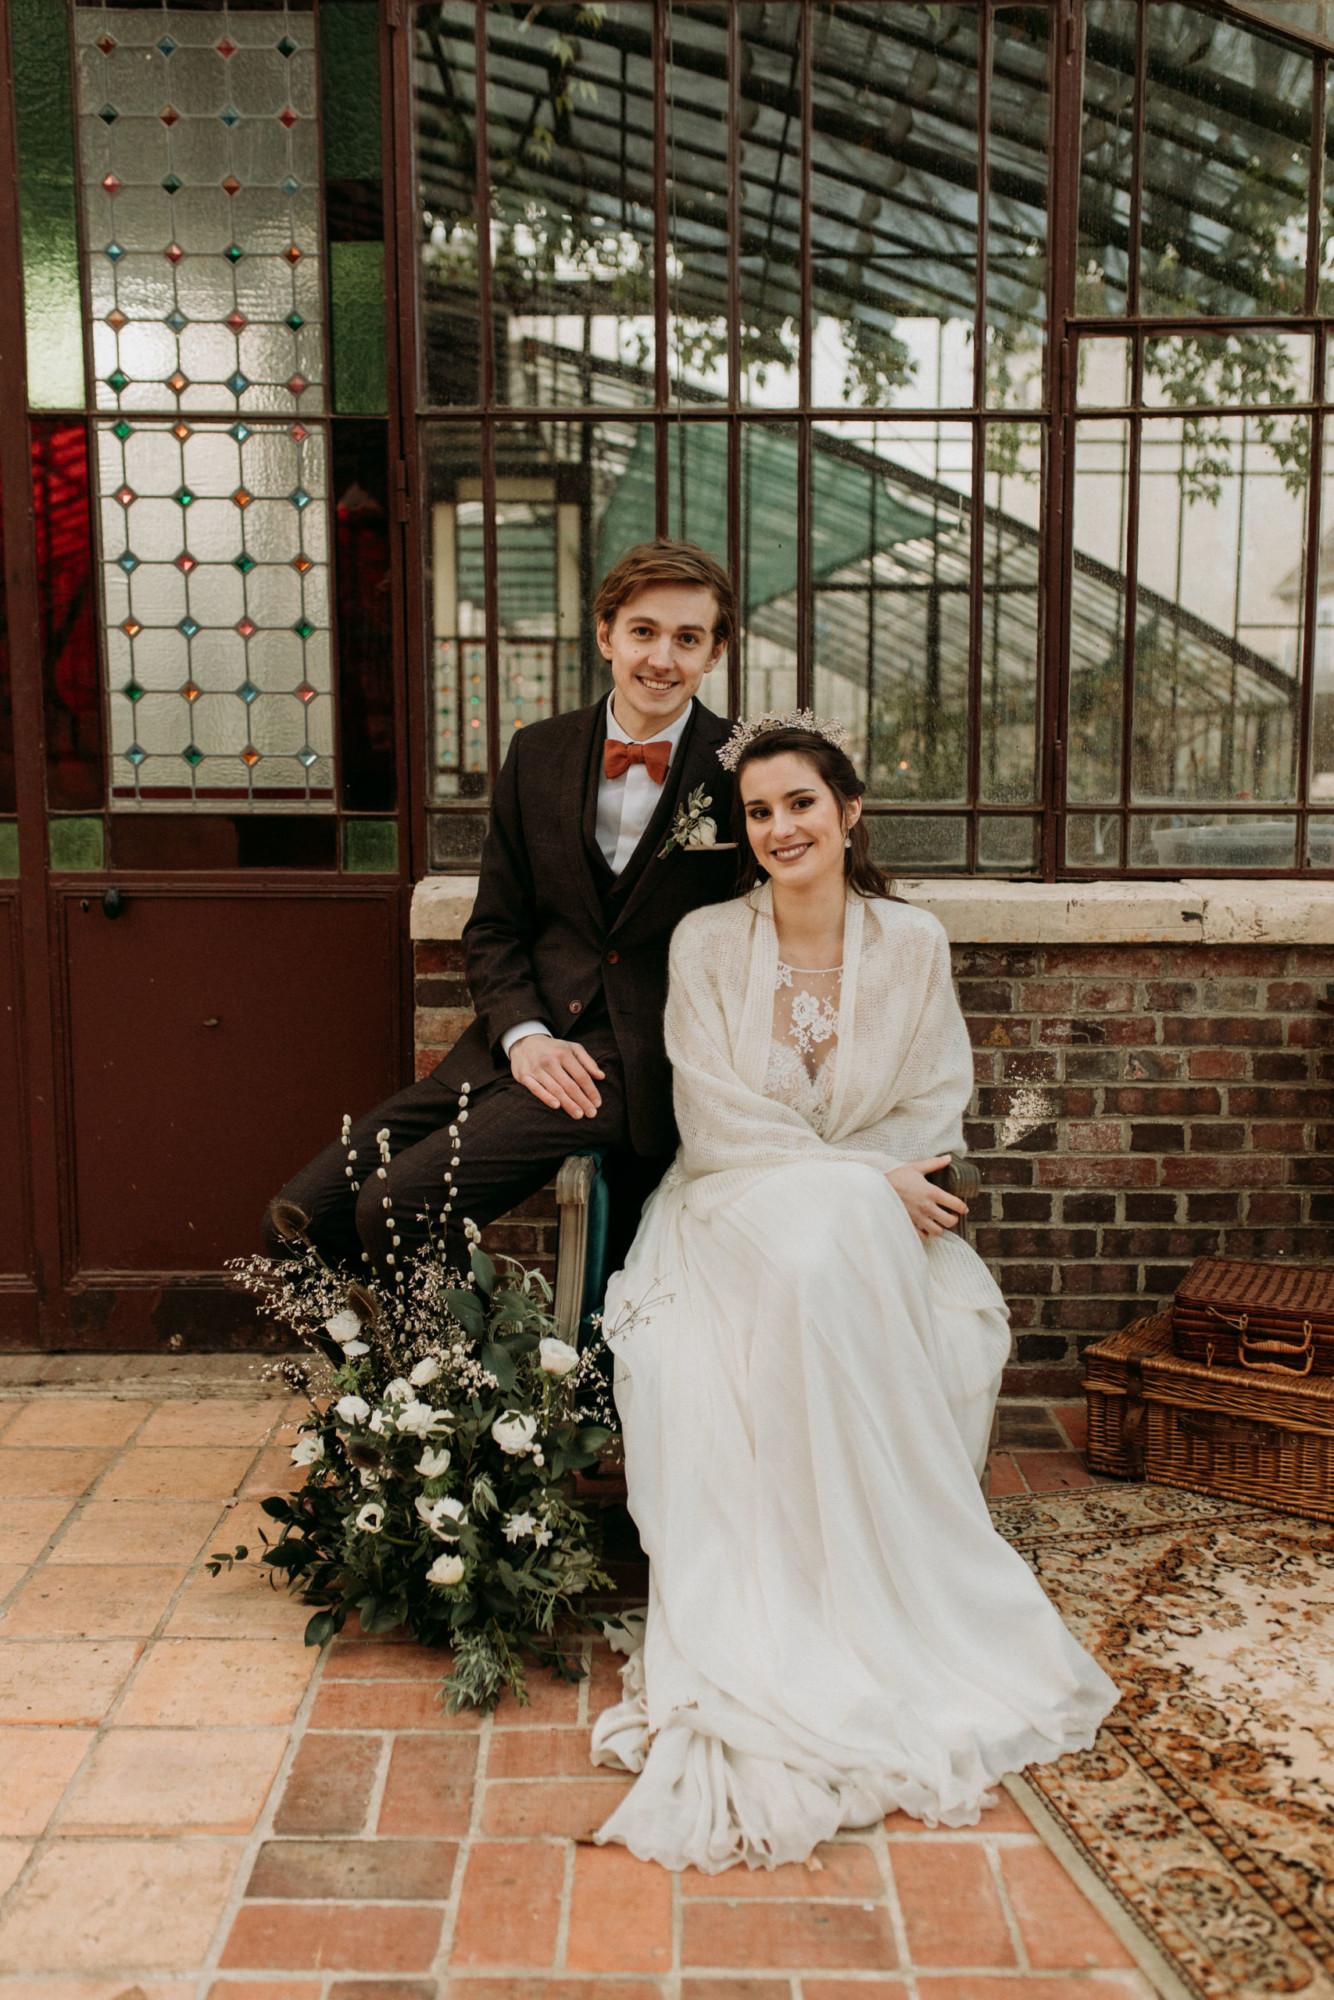 Domaine verderonne mariage photobooth et mariés